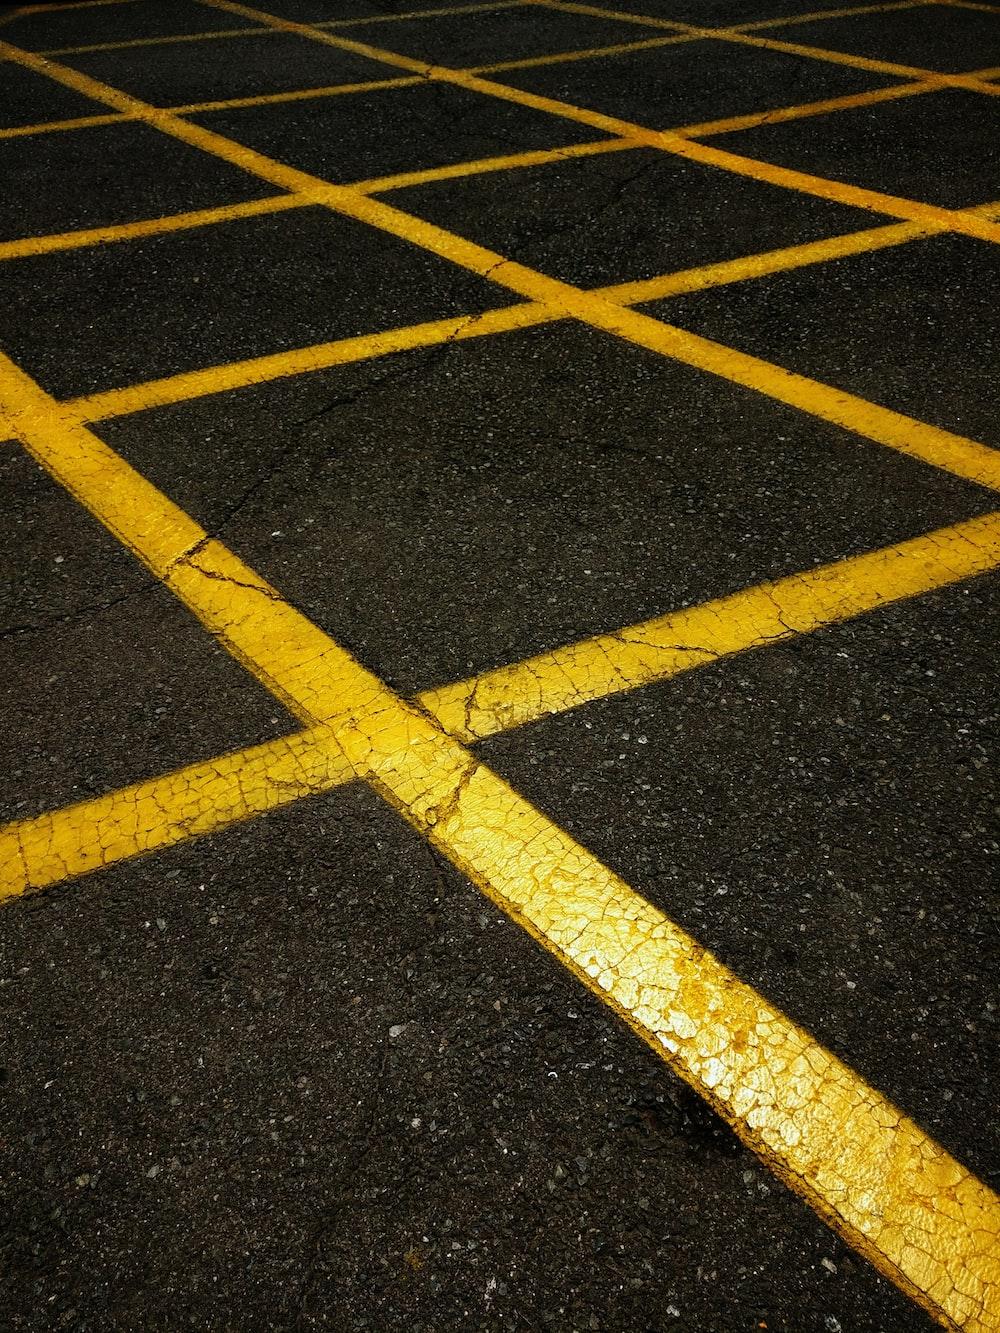 black and yellow pavement